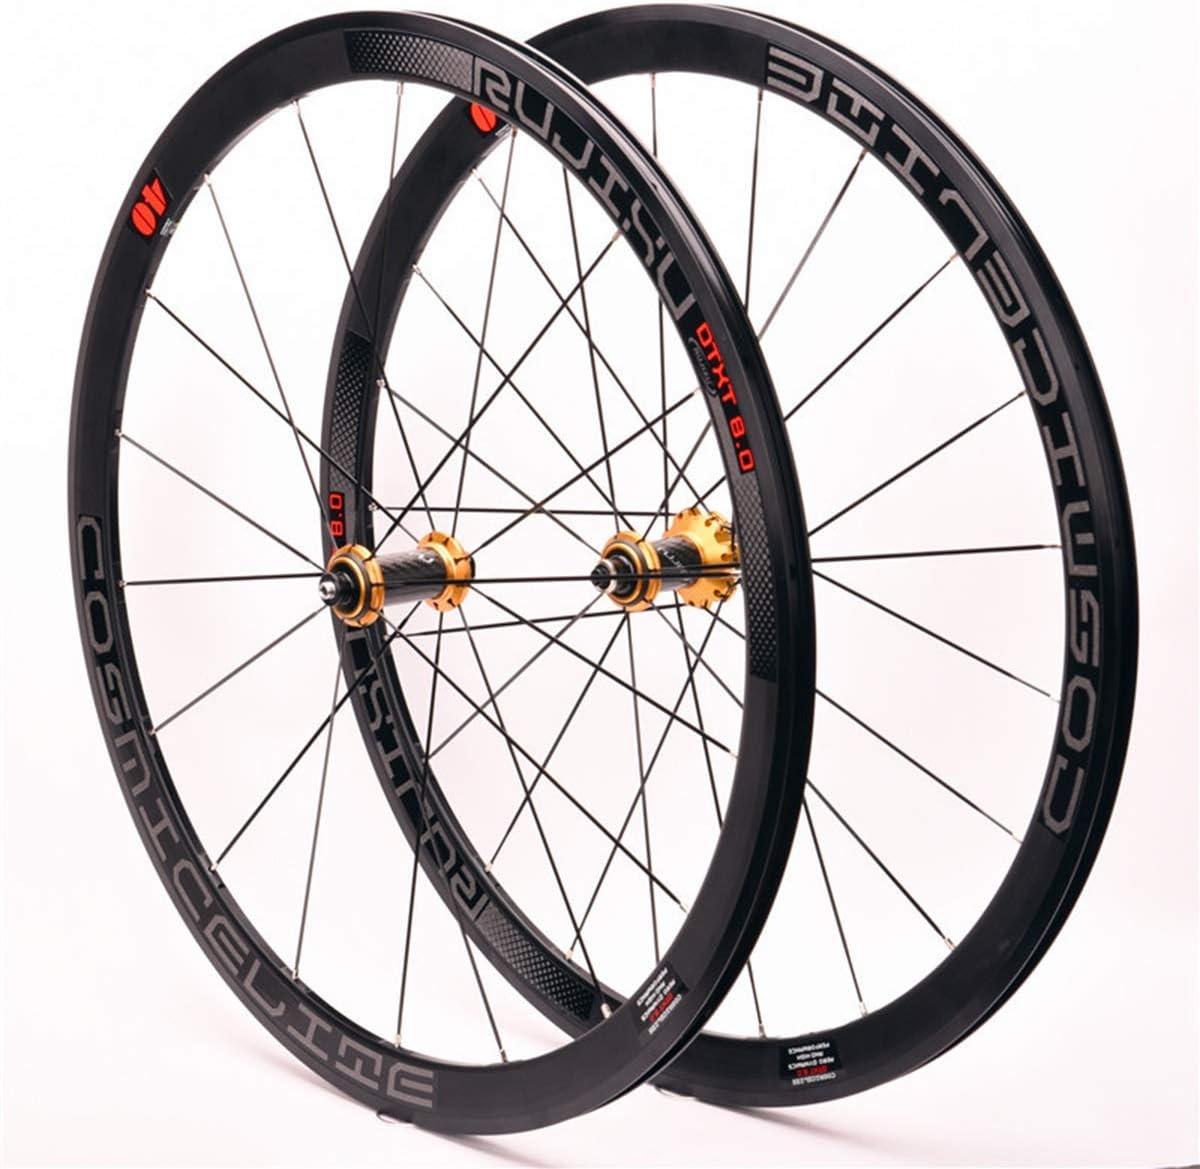 MZPWJD 700c 35% OFF Rim Road 70% OFF Outlet Racing Bike Wall Whe V- Double Brake Wheels